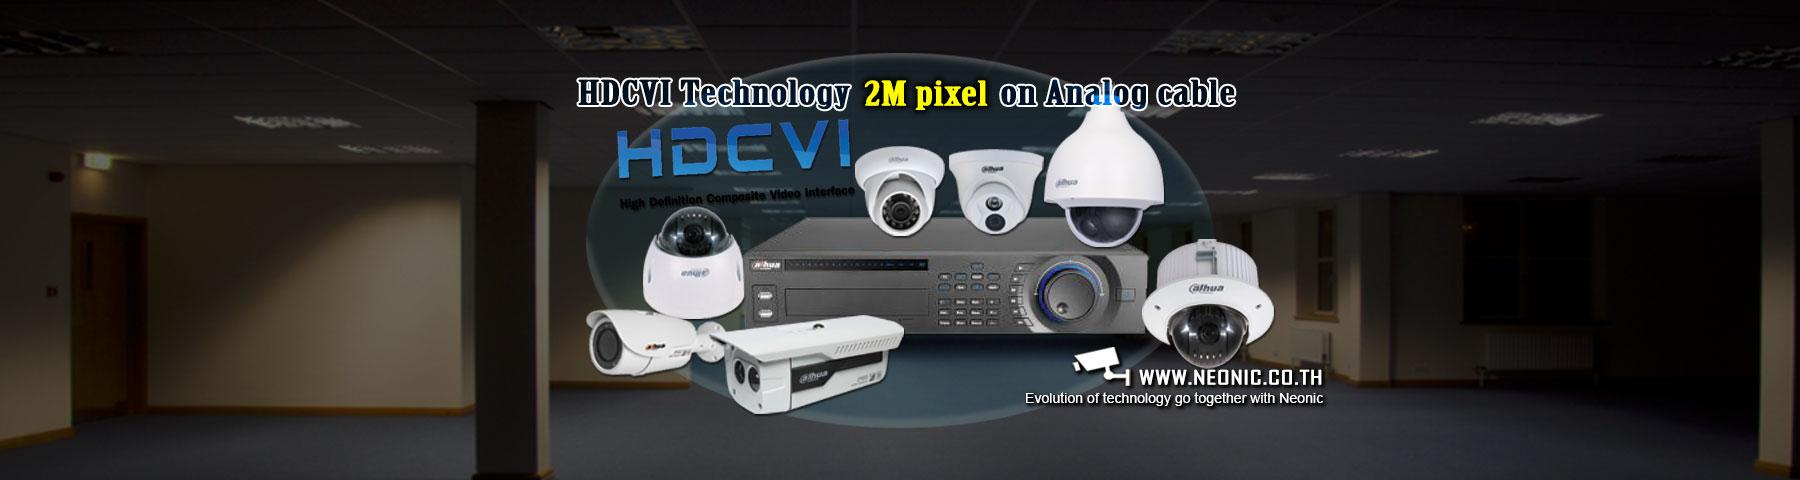 HDCVI New Technology